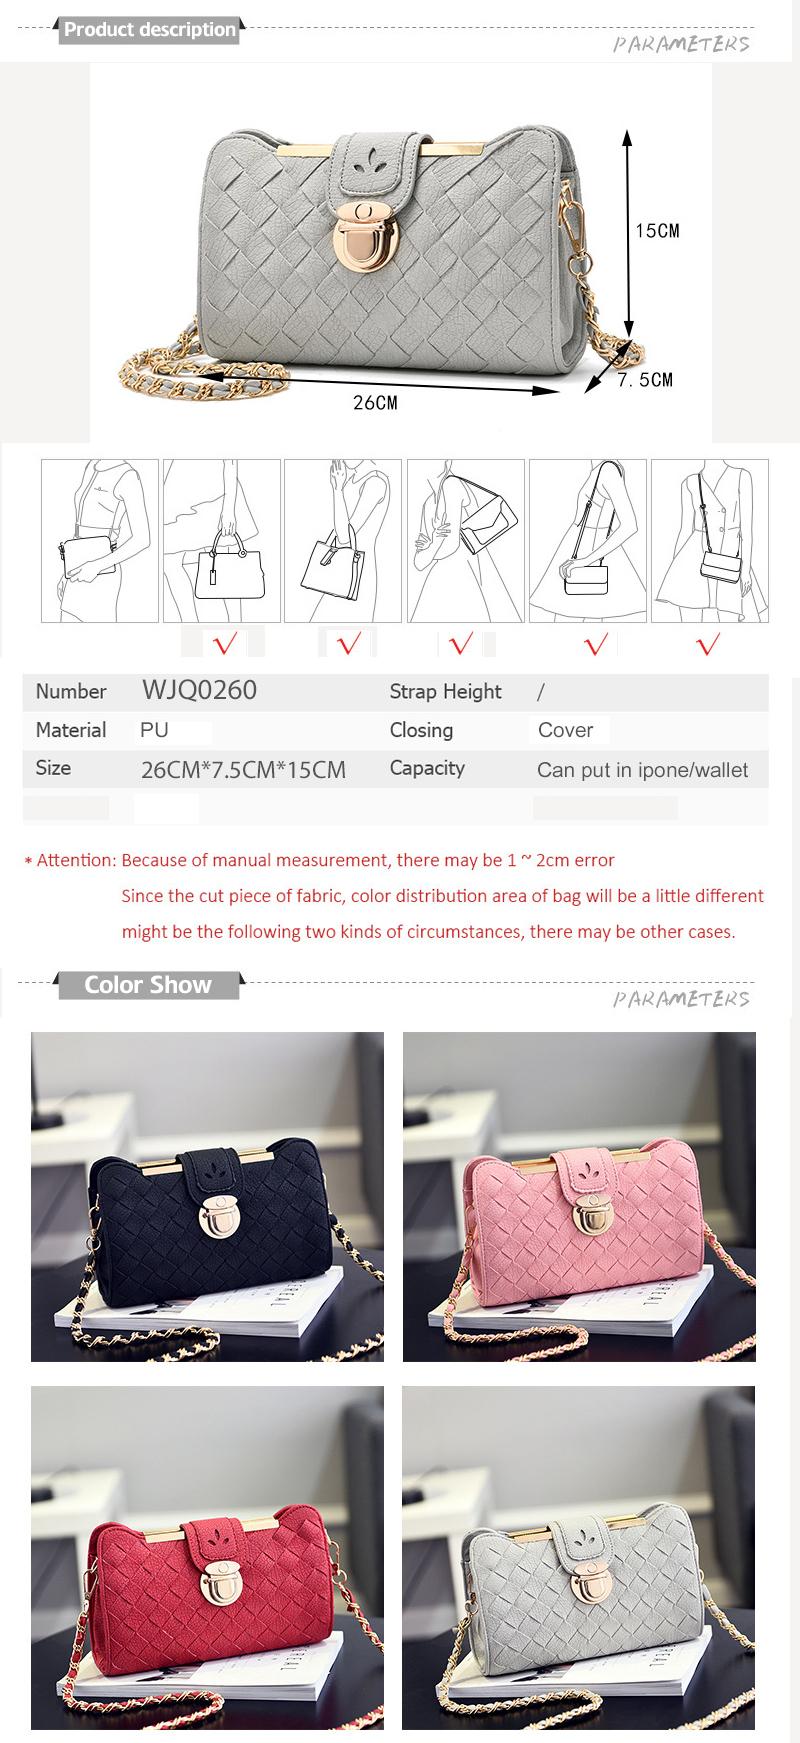 2017 New Fashion Bag Casual Women's Shoulder Bag Female Messenger Bag Ladies Brand Leather Chains Soft Polyester Crossbody Bag (1)